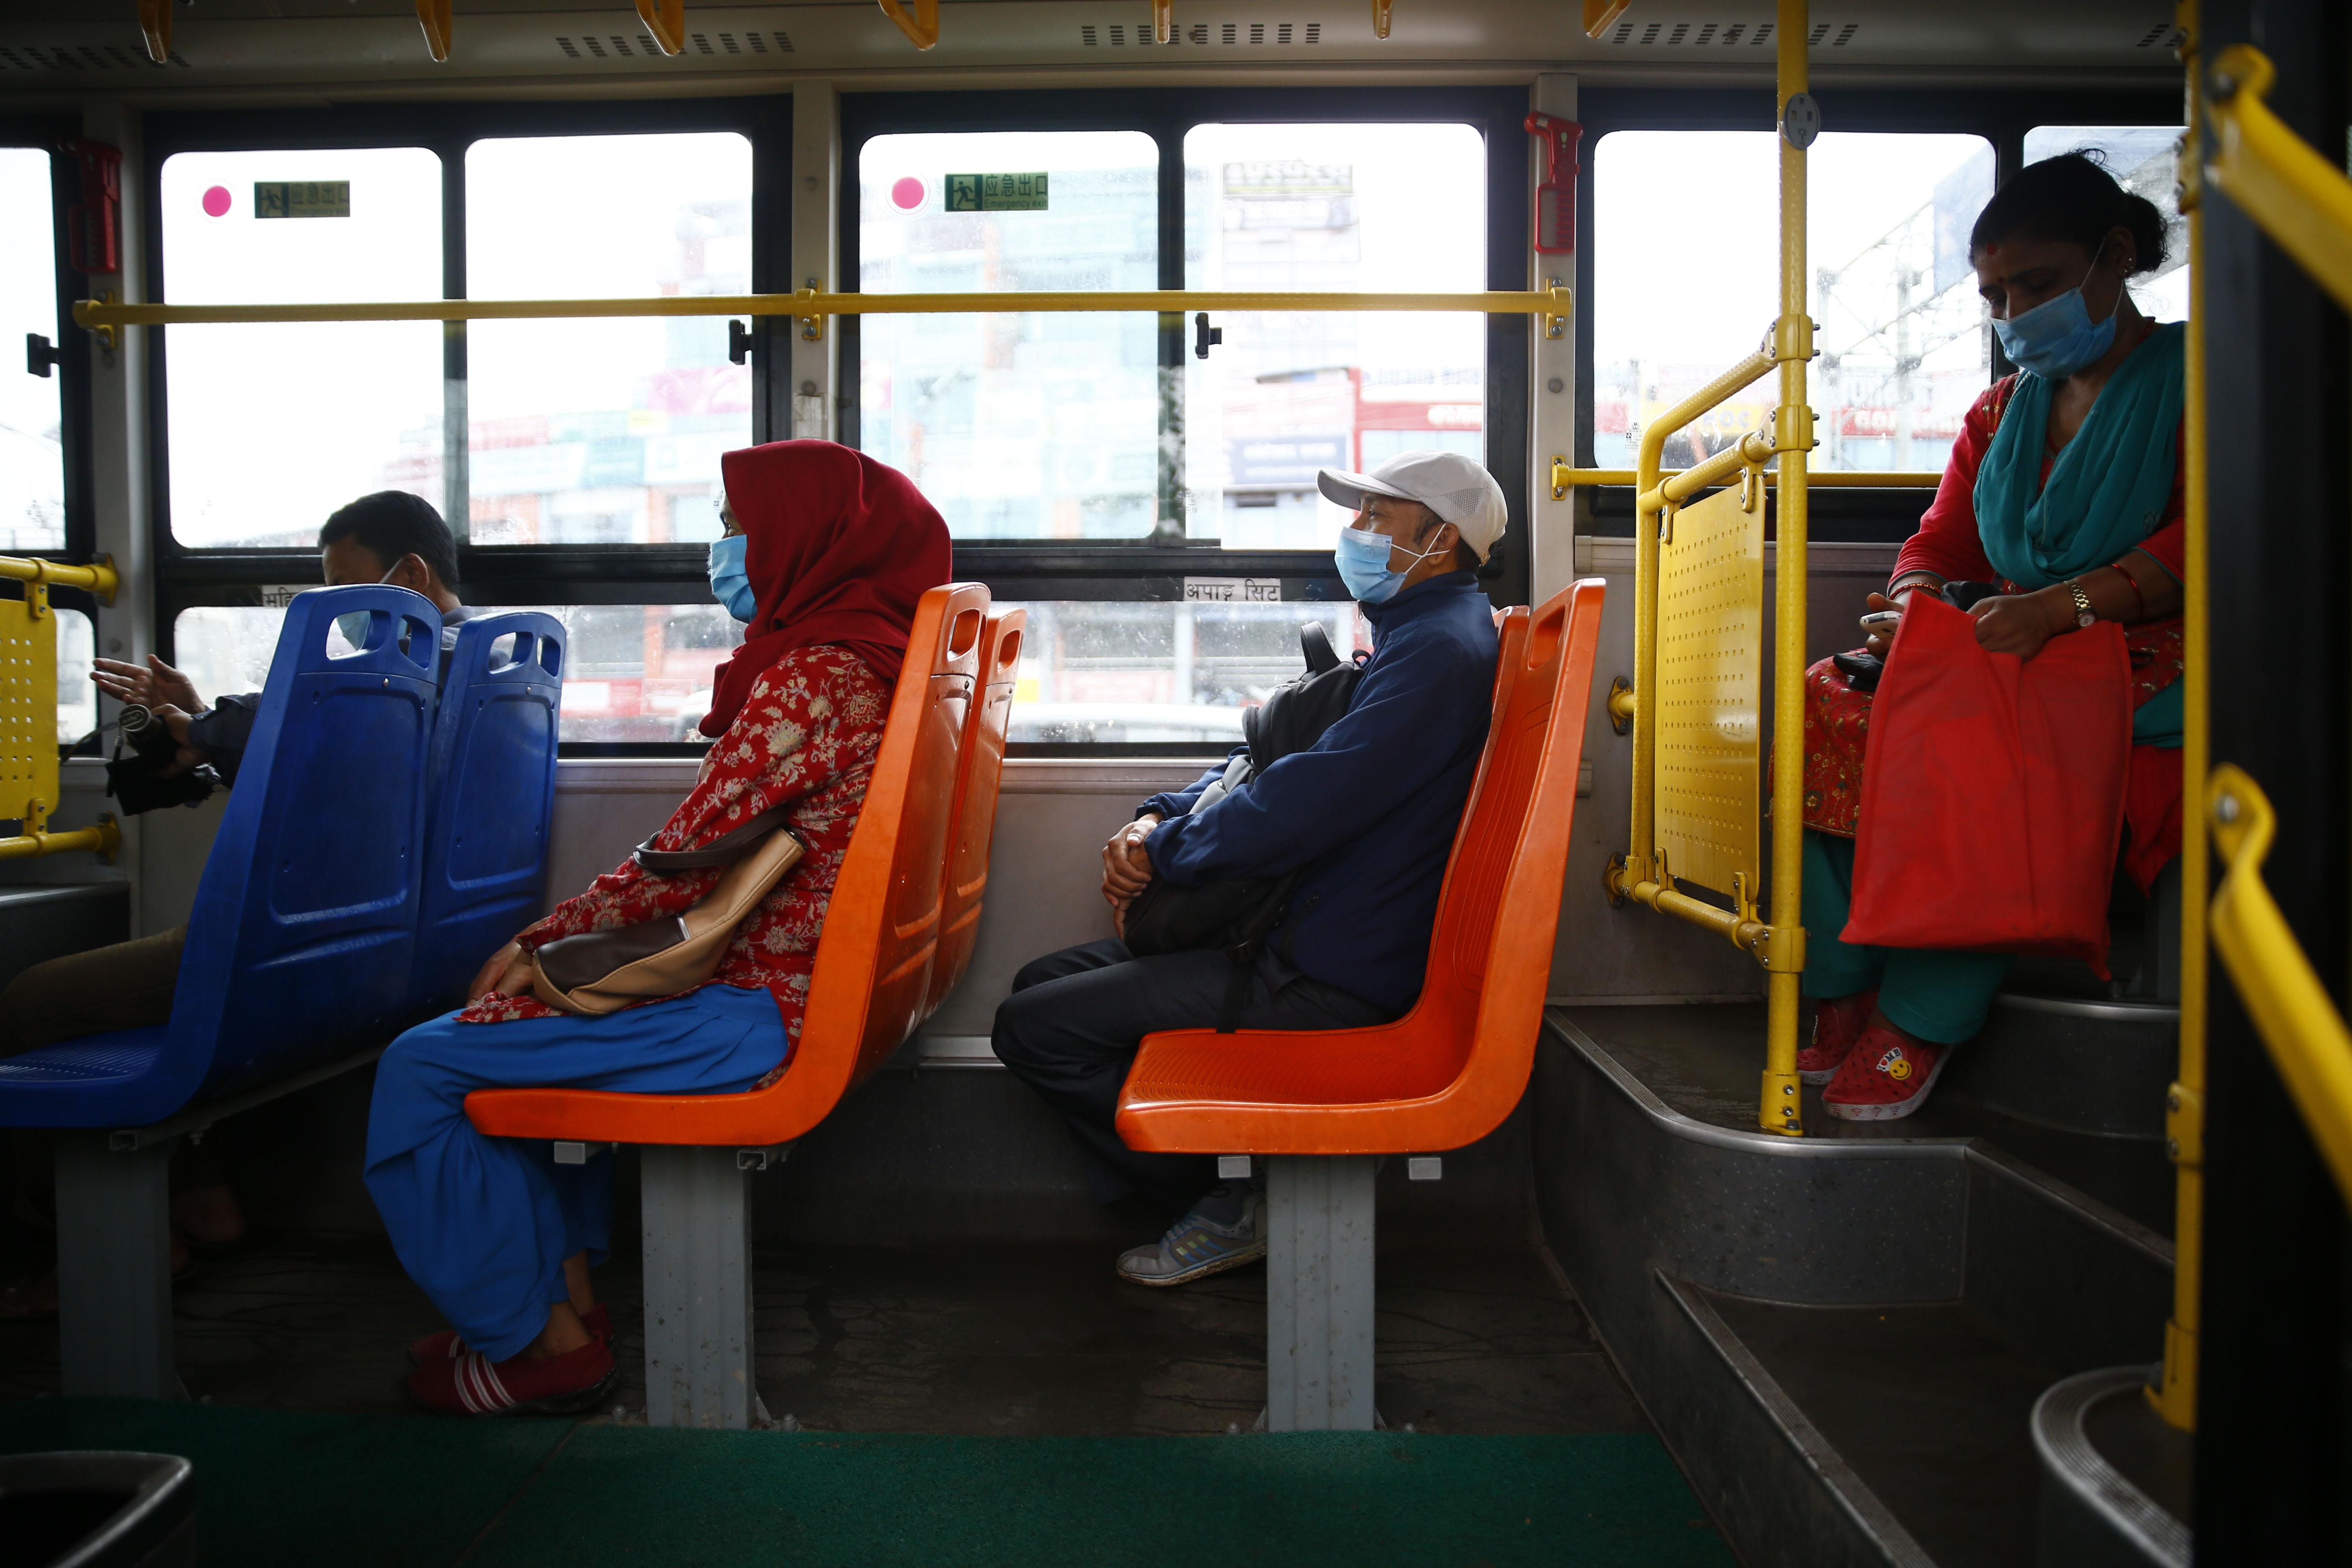 Passengers on board the recently launched Sundar Yatayat bus, as public transportation services gradually resume amid coronavirus pandemic, in Kathmandu, on Tuesday, July 14, 2020. Photo: Skanda Gautam/THT